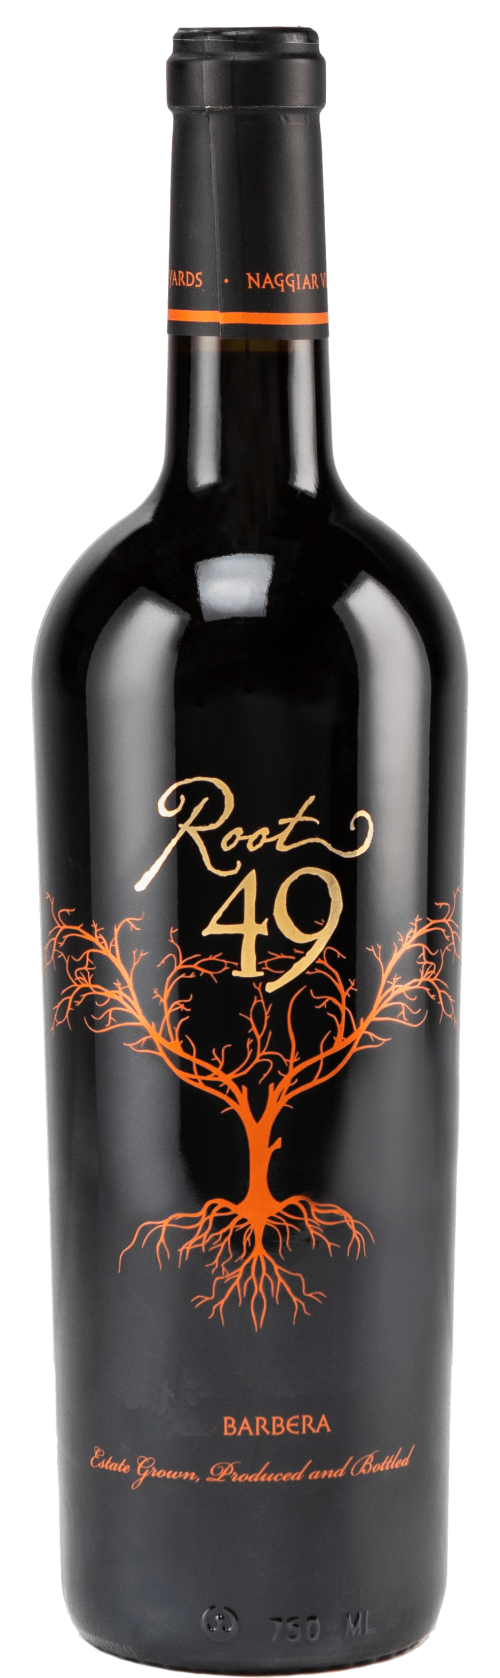 Root 49 Barbera wine bottle